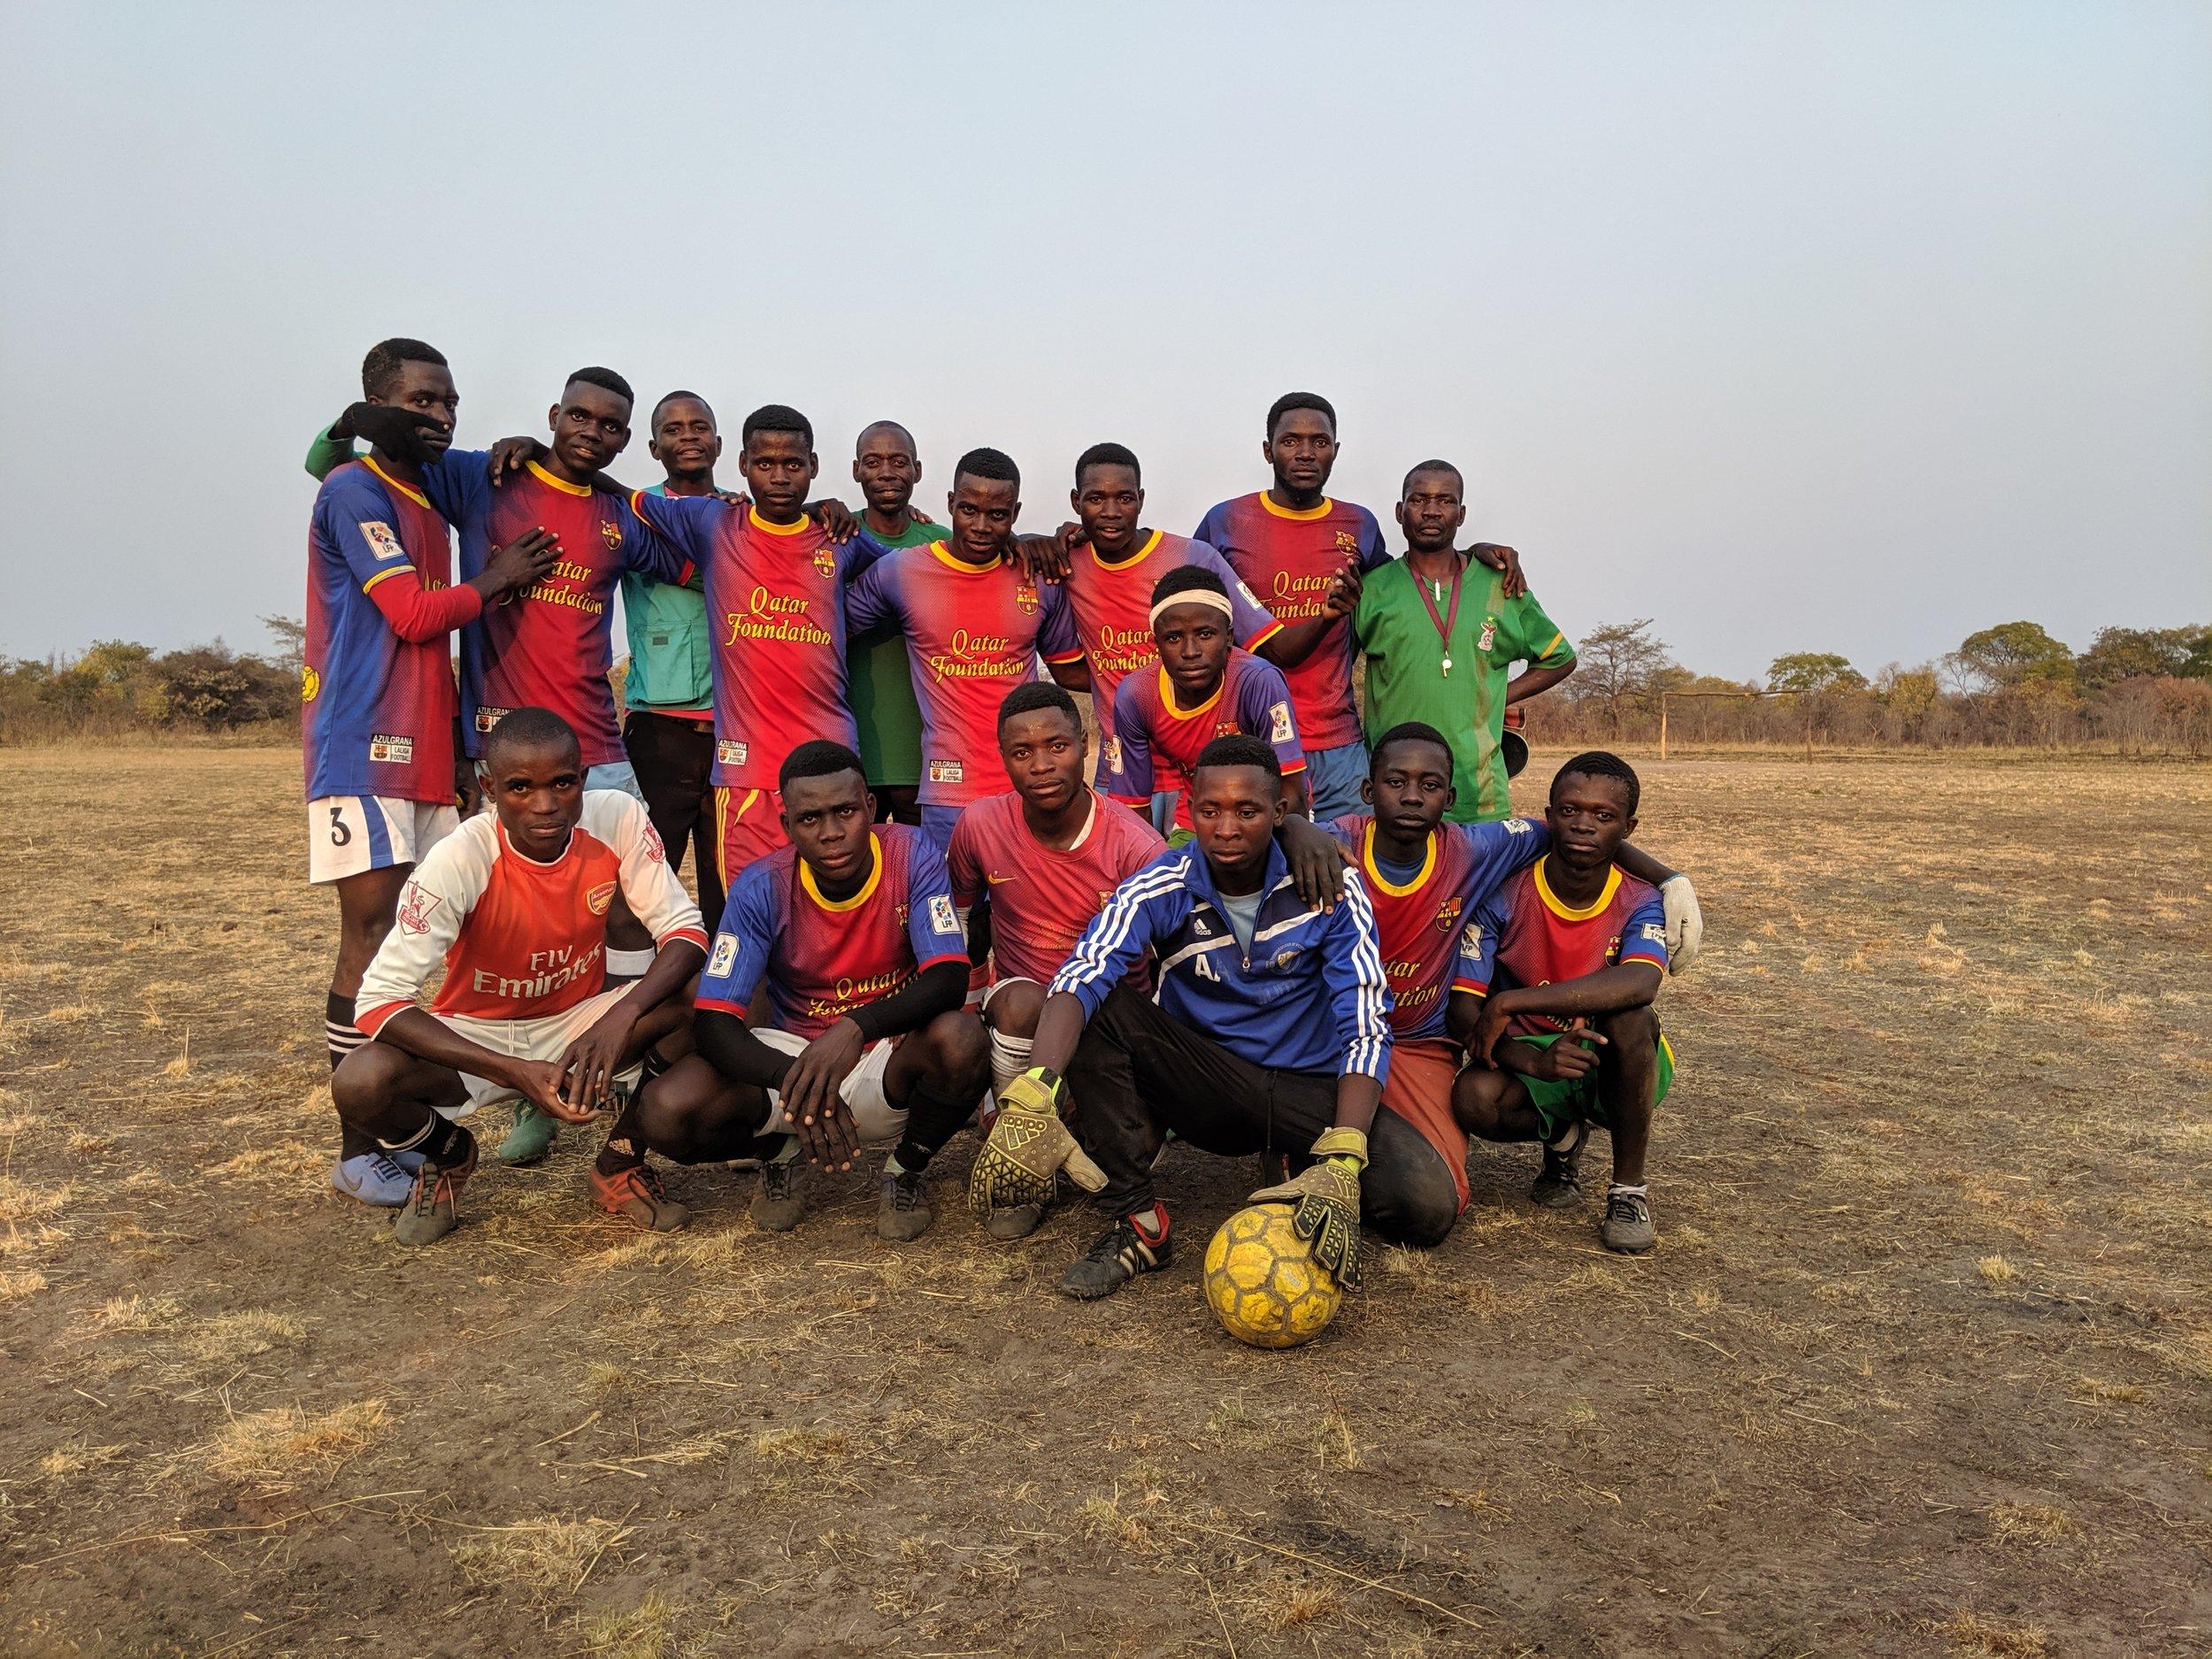 Shamiyoyo Young Champions